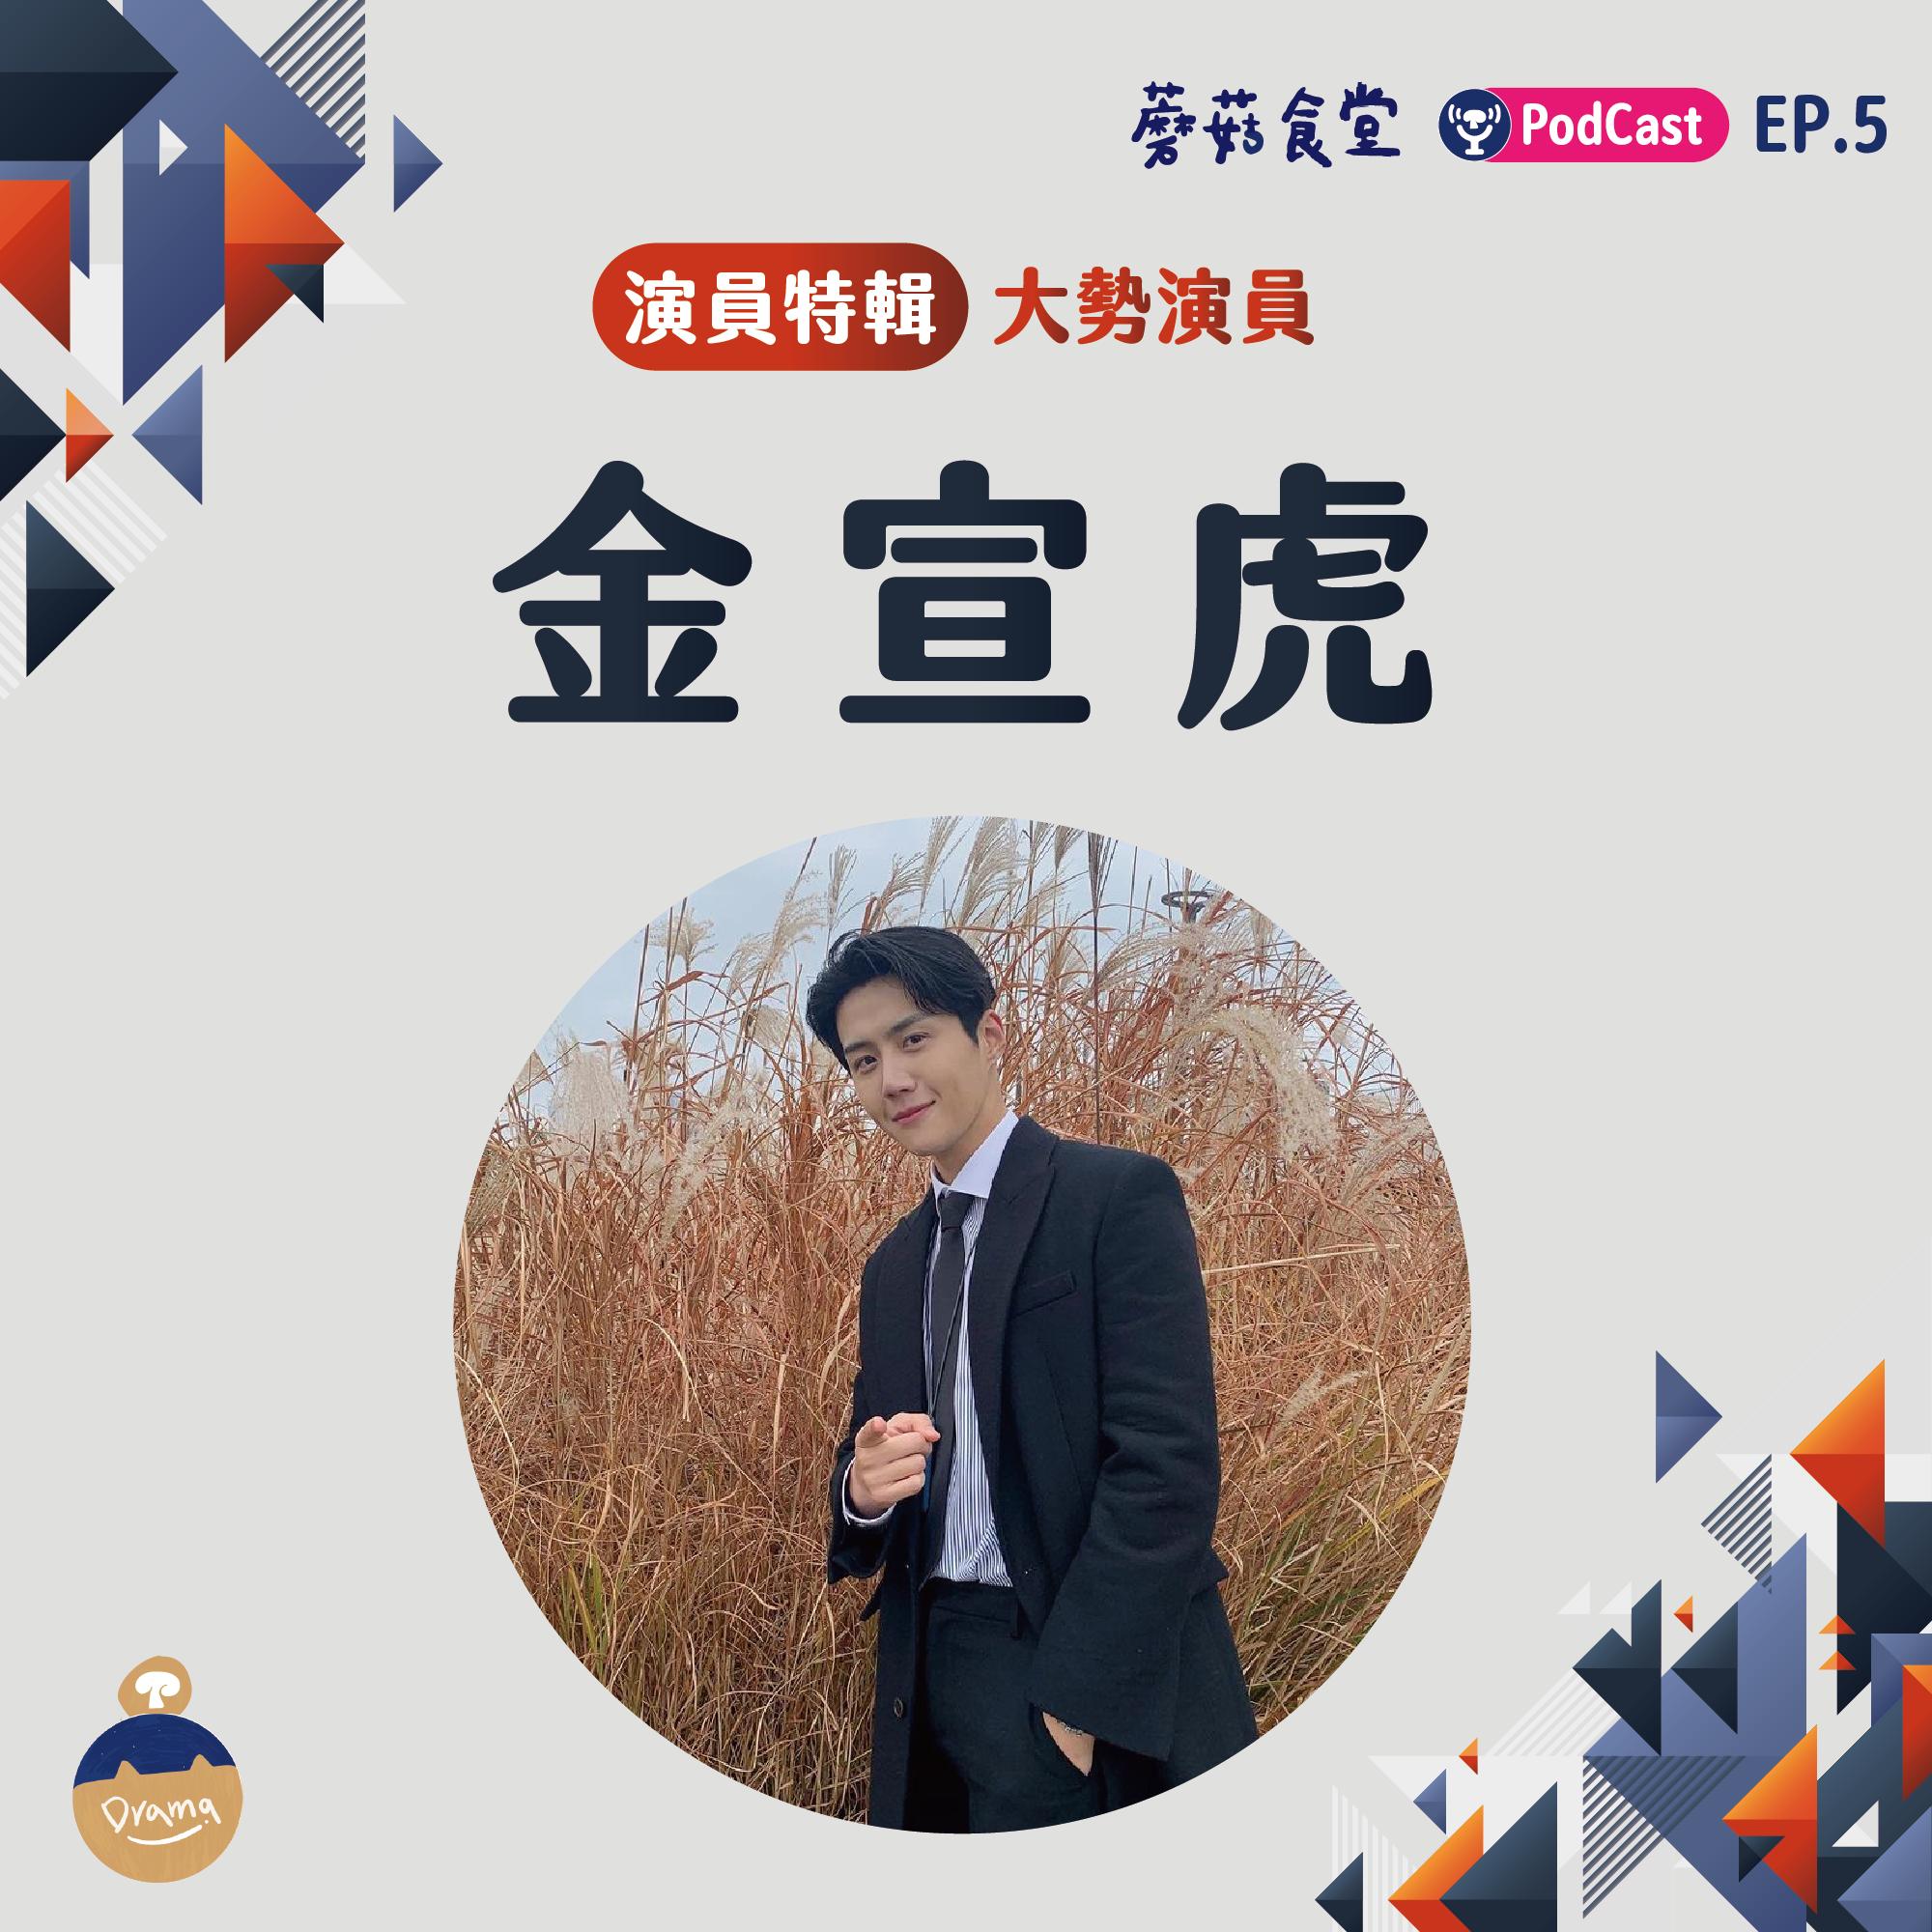 Ep5:大勢演員 – 金宣虎 (演員特輯)